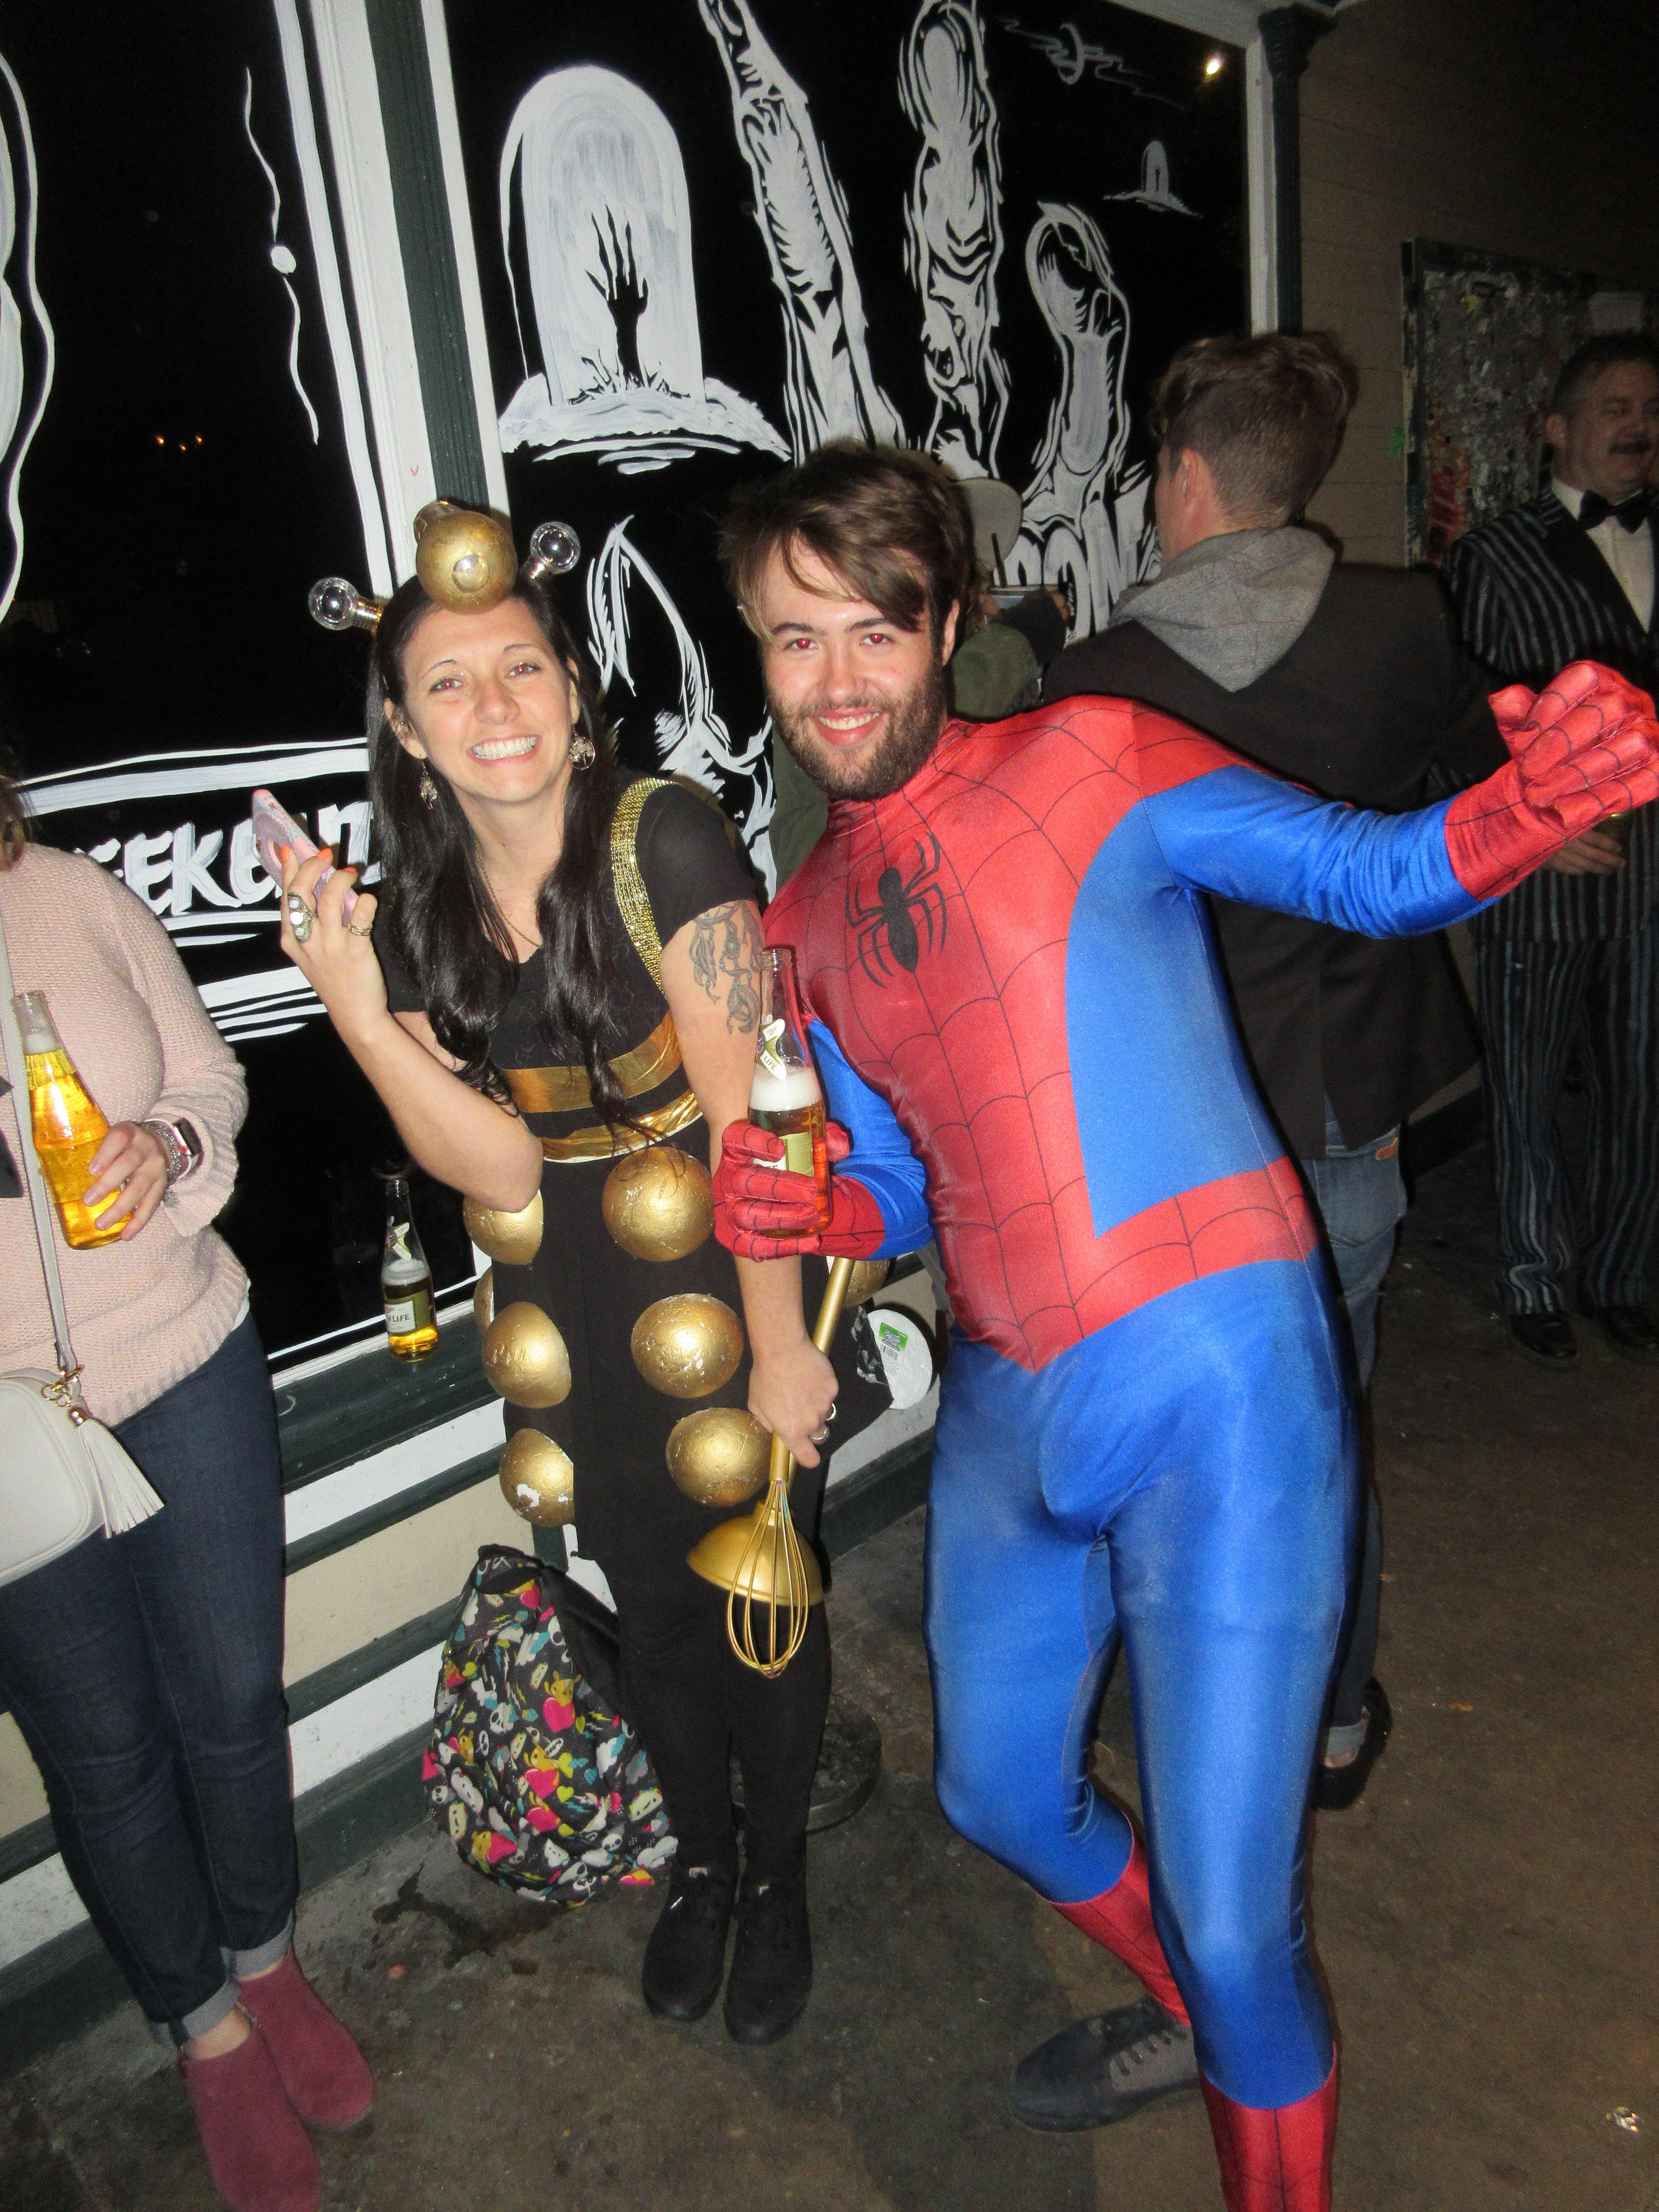 file:halloween 2017 in new orleans dalek spiderman - wikimedia